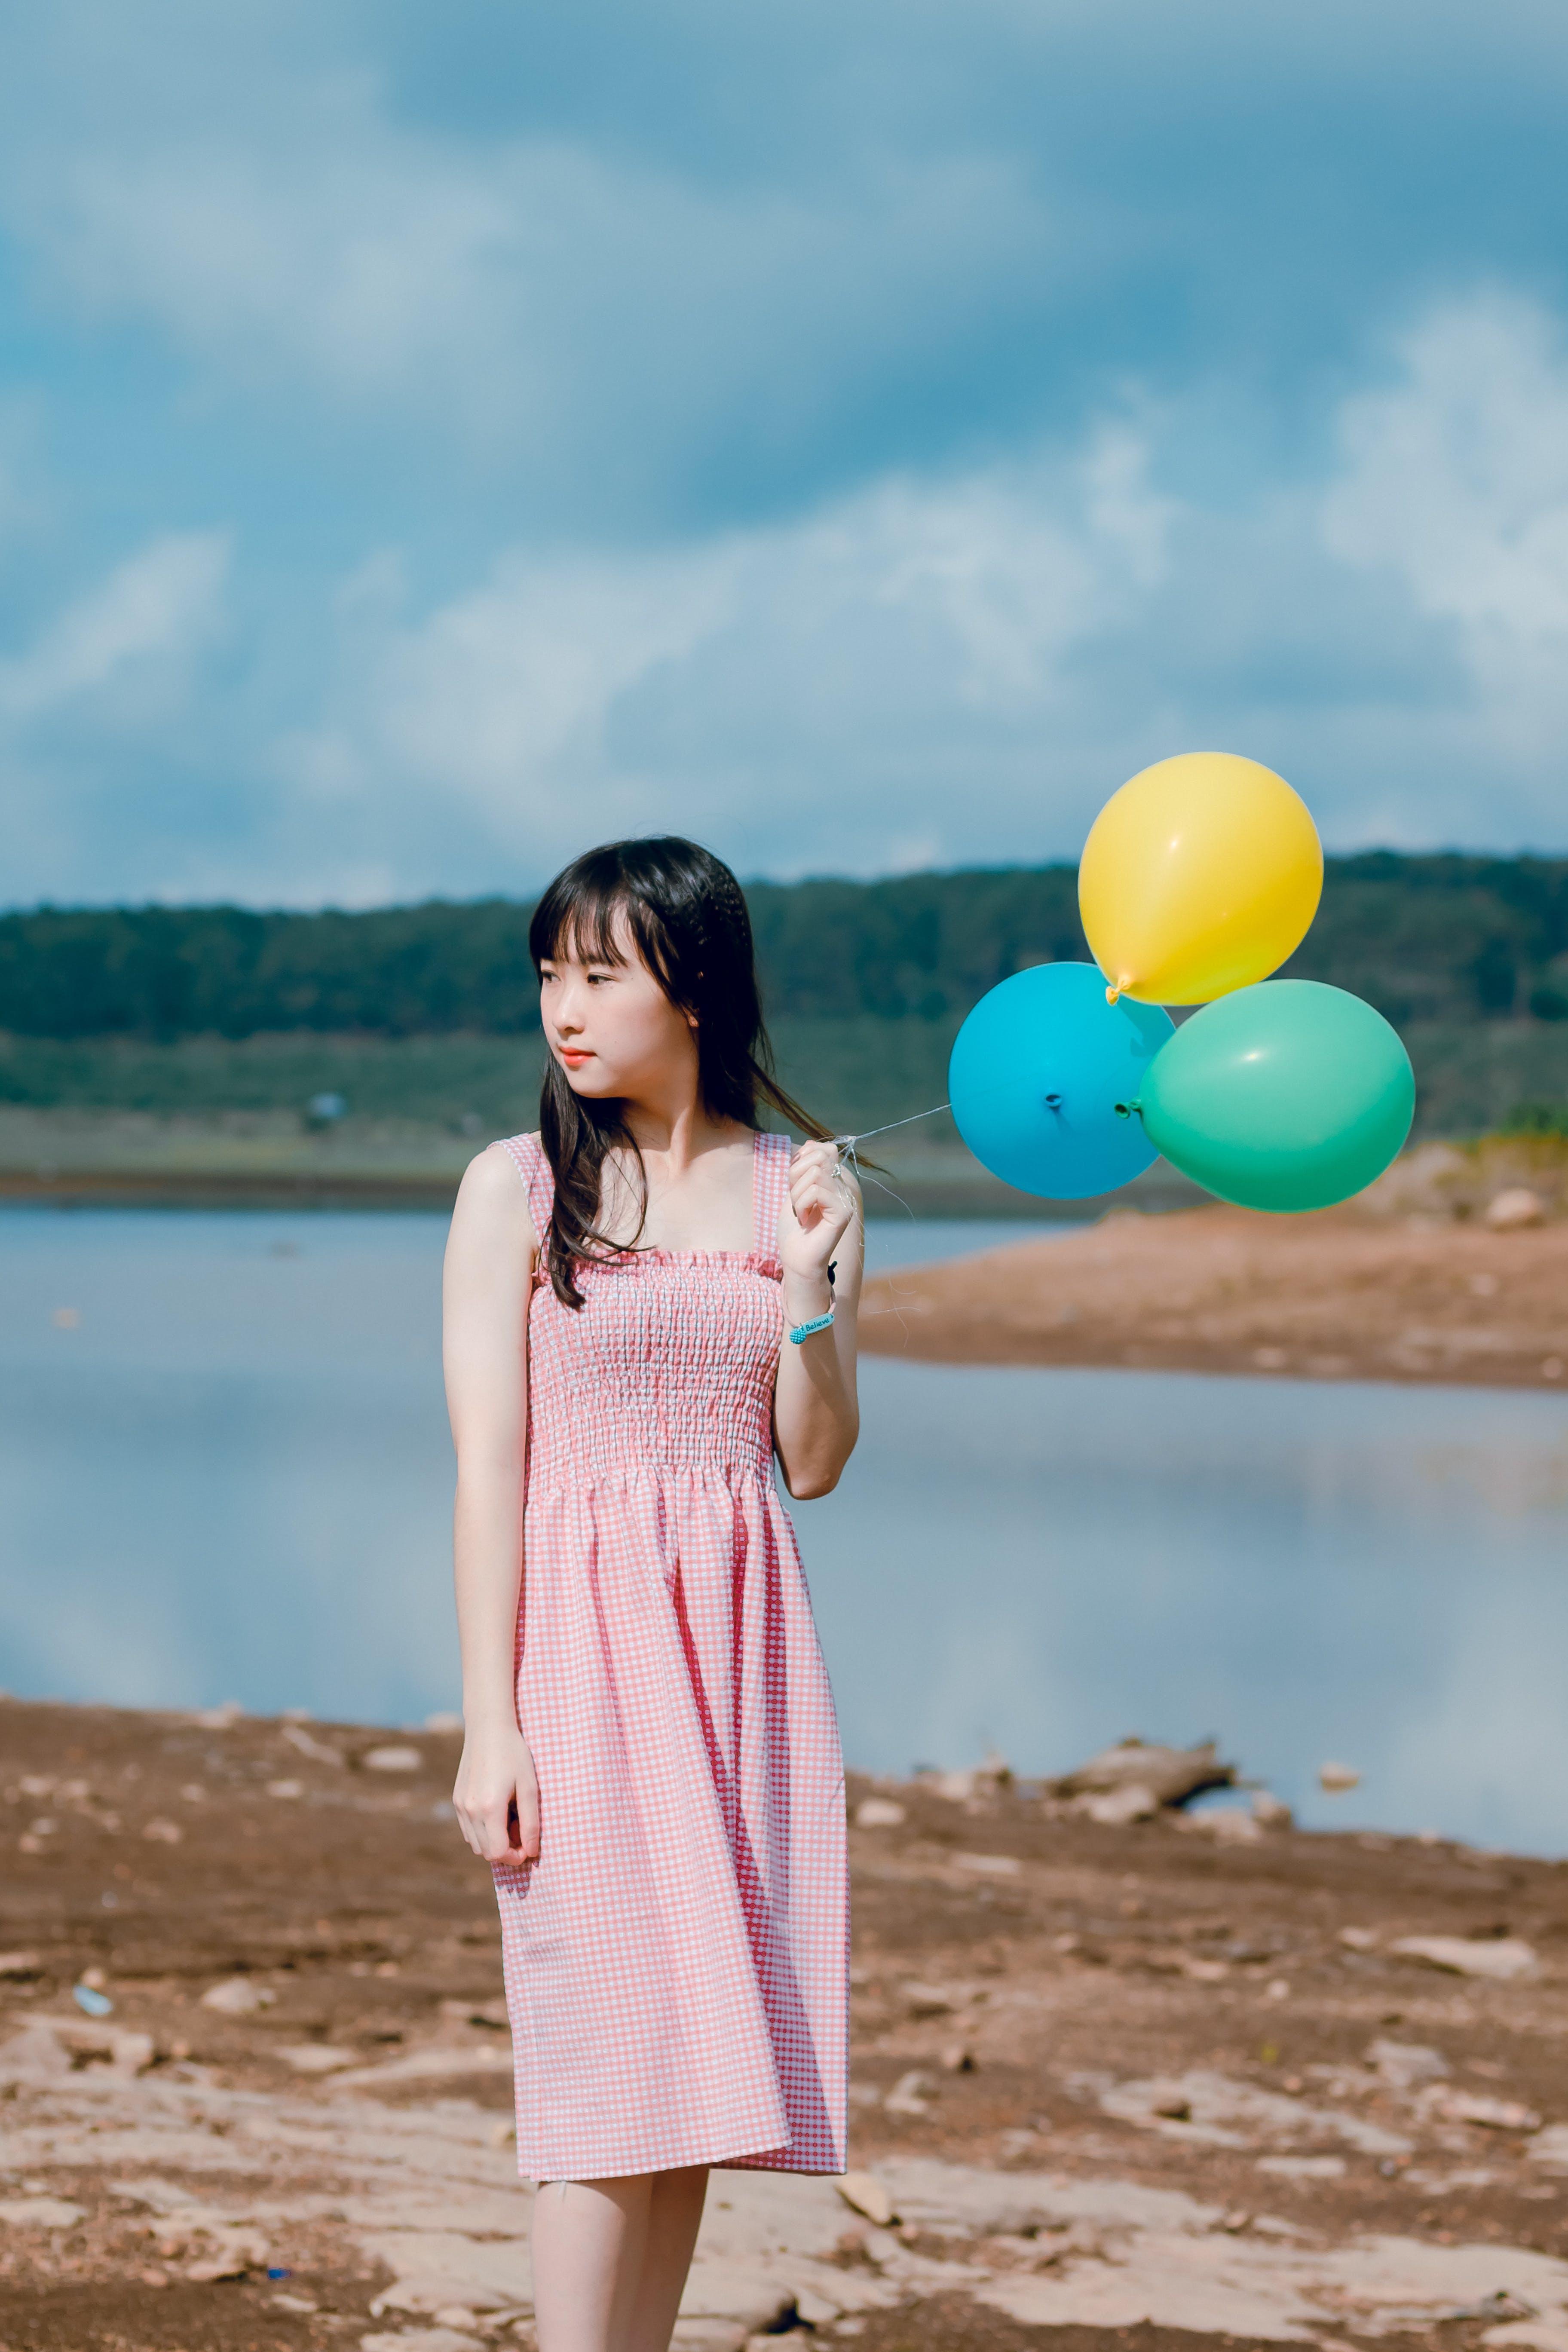 Woman Wearing Pink Dress Holding Three Balloons Near Body of Water